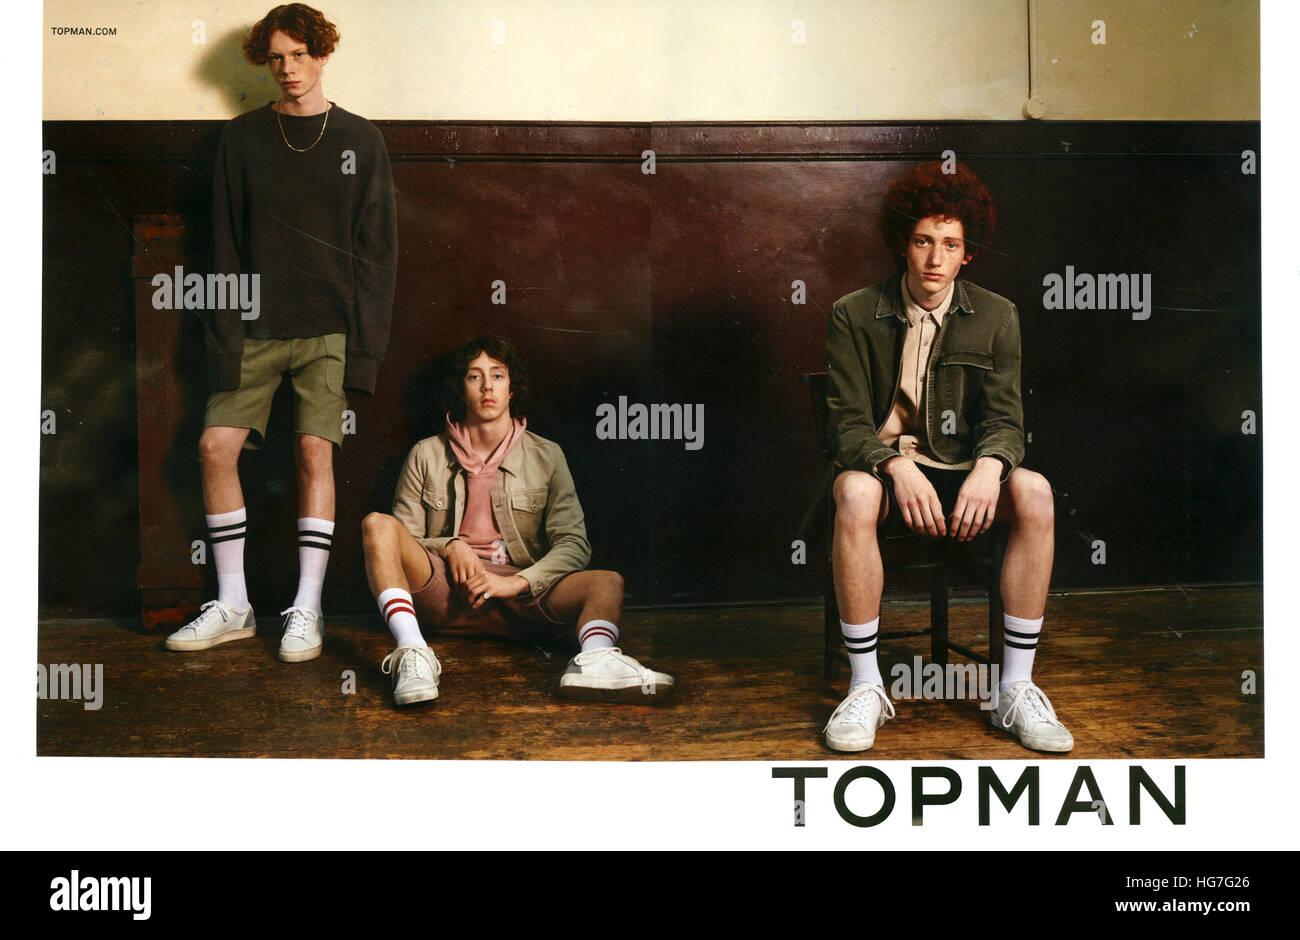 2010s UK Topman Magazine Advert - Stock Image